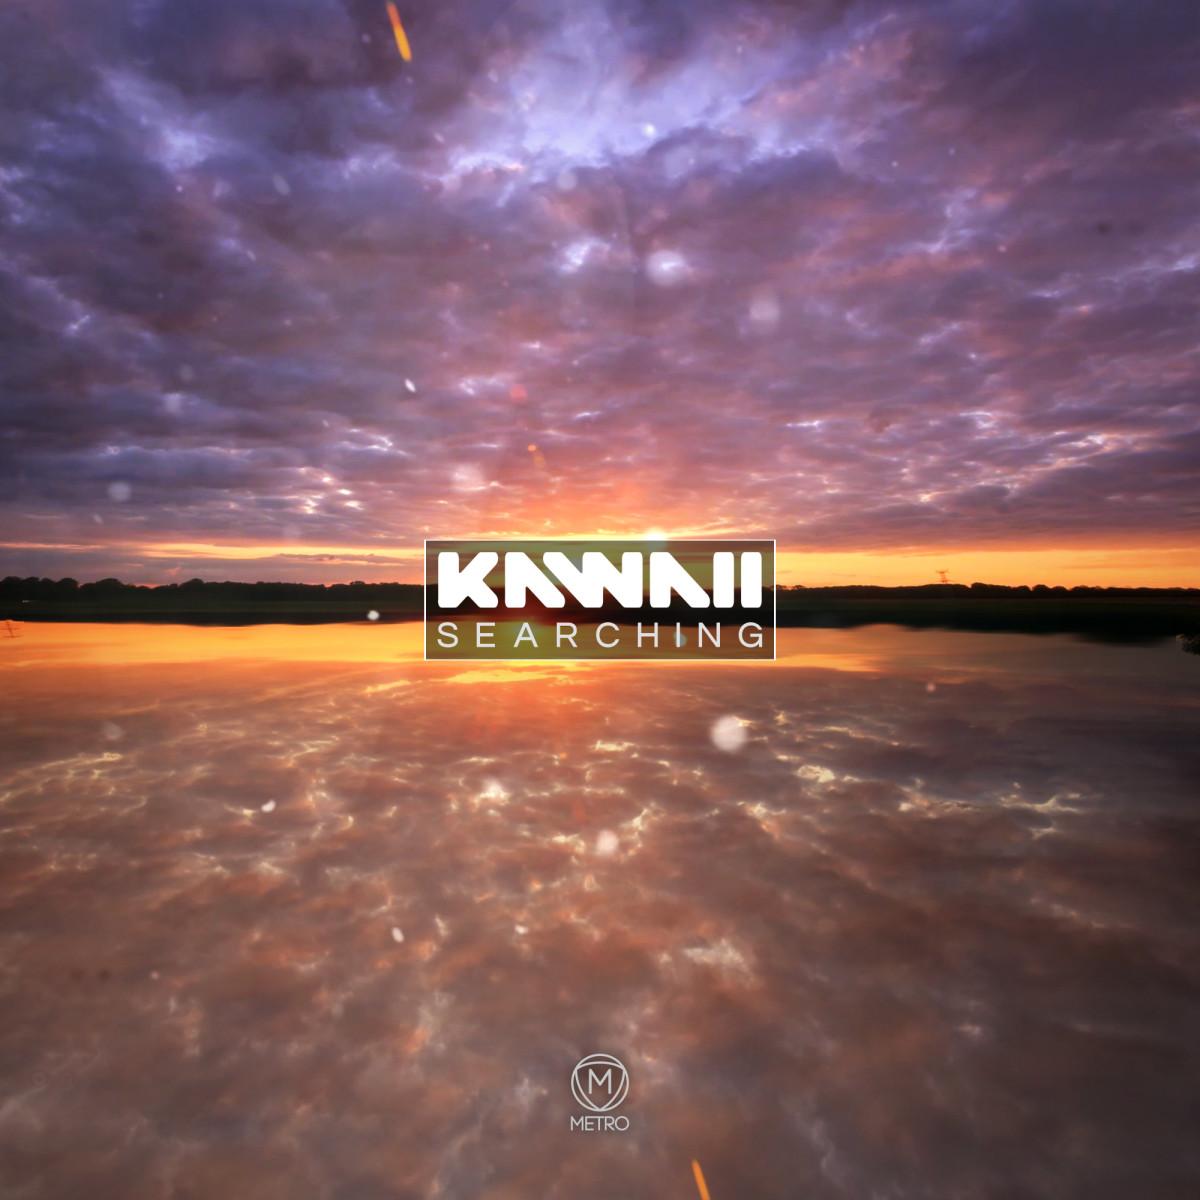 MTRR033 - Kawaii - Searching -  Artwork FINAL